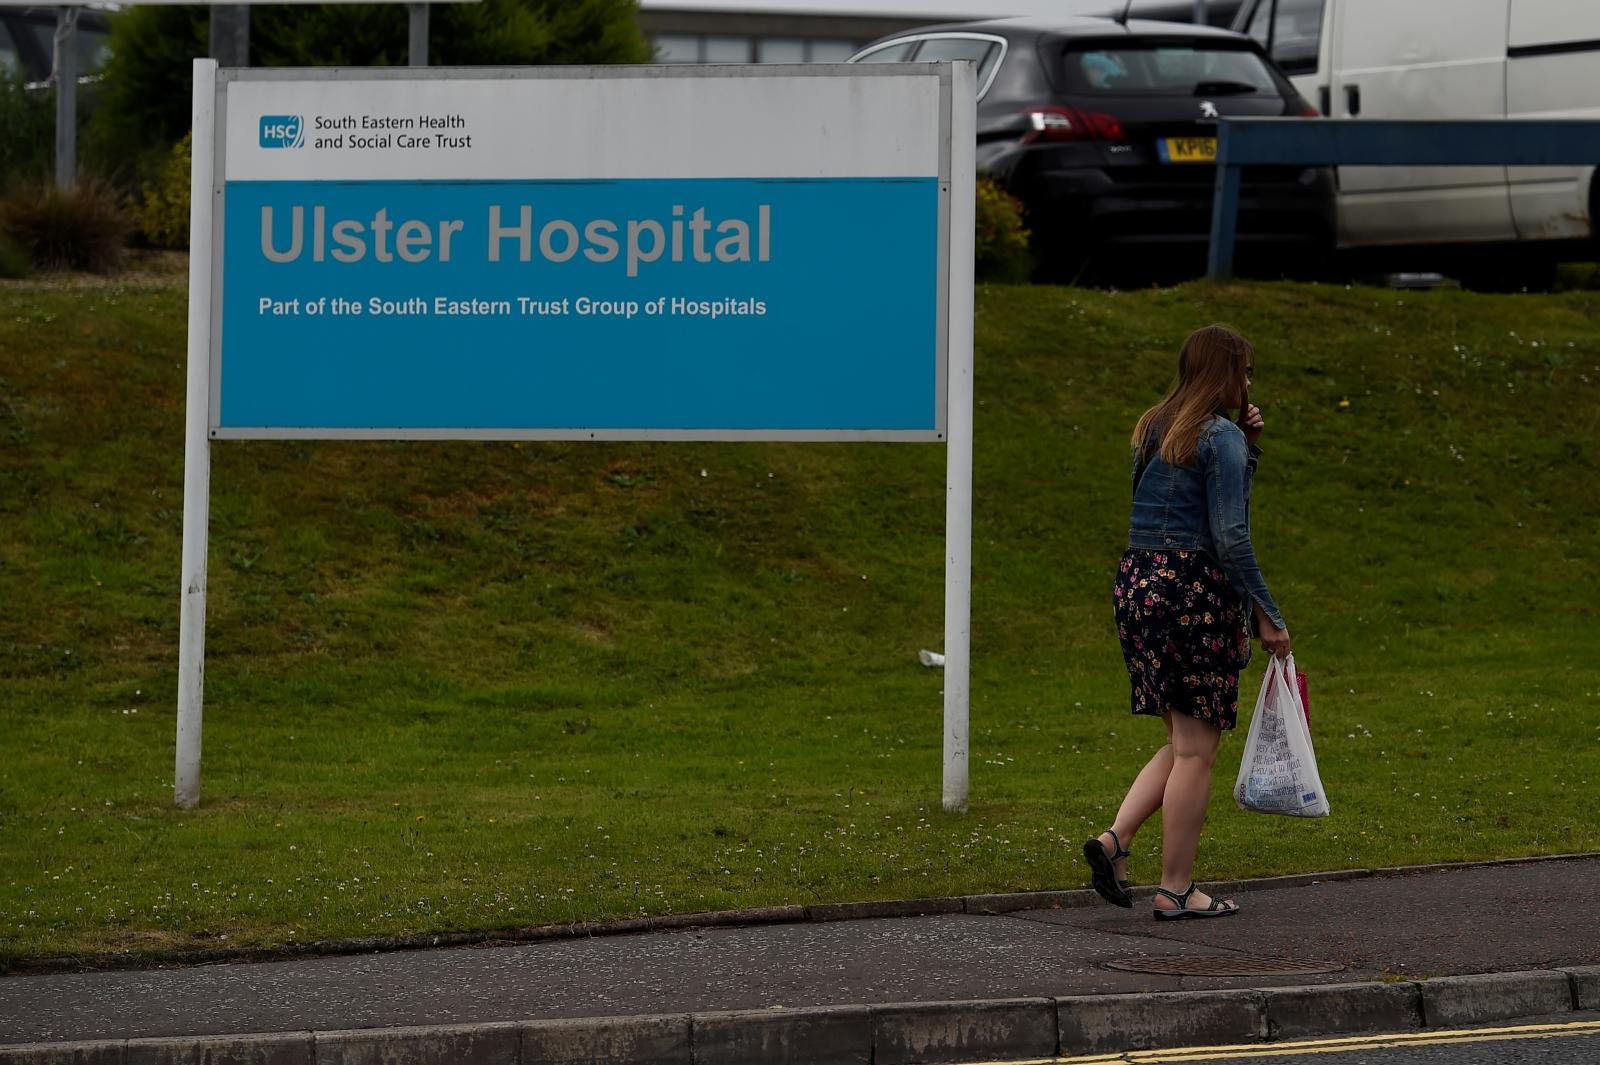 Ulster Hospital